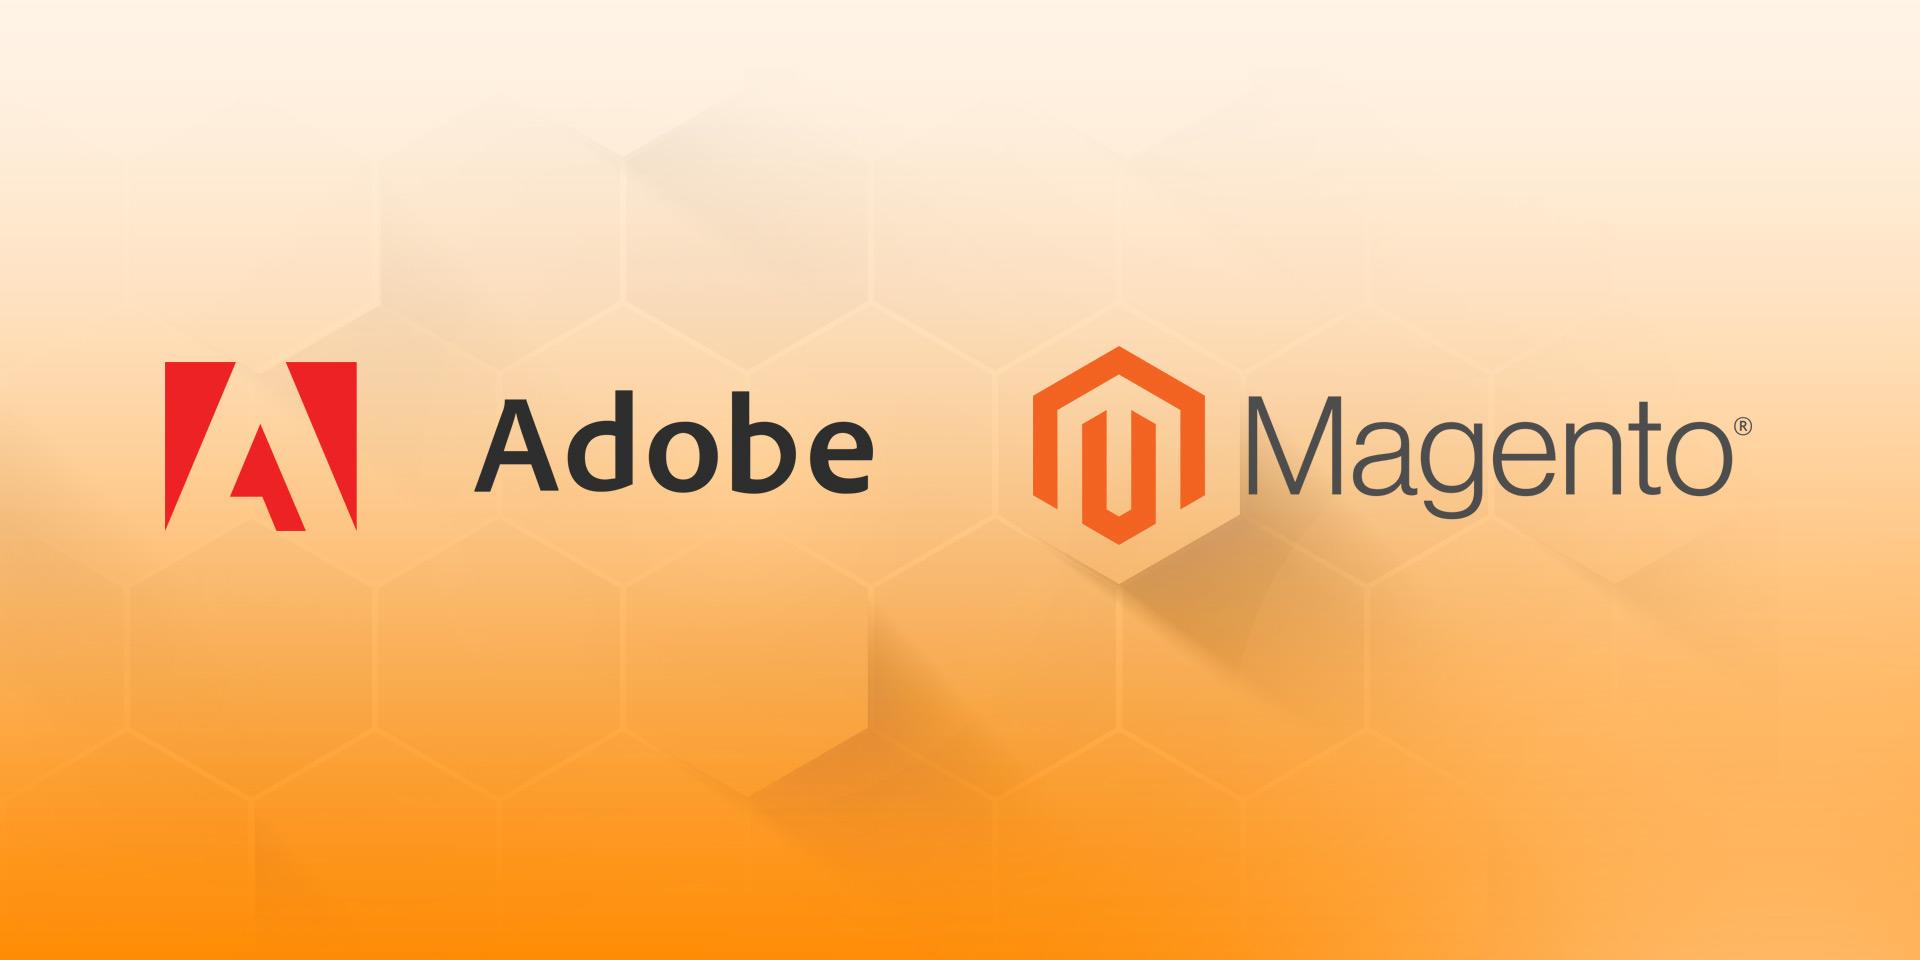 Adobe to Acquire Magento for $1.68bn